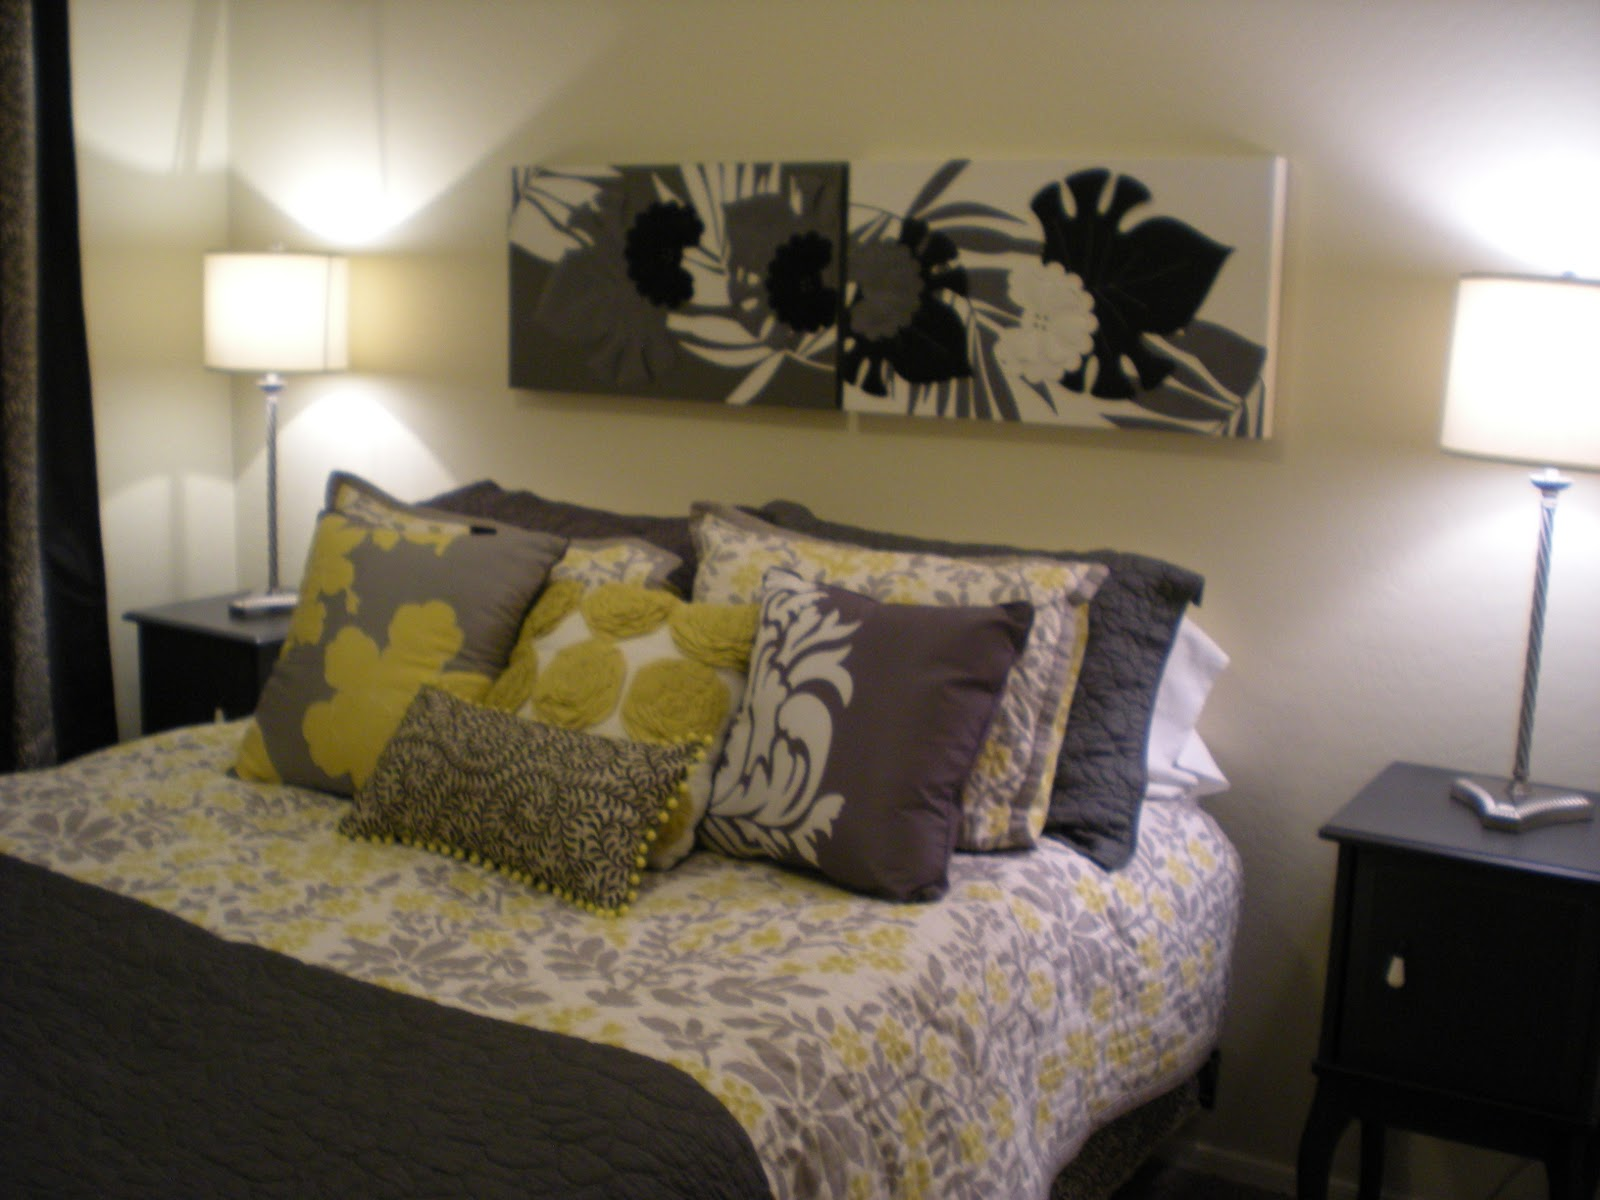 From Chaotic Master Bedroom Http Idea4homedecor Com Shabby Chic Home Decor Design Ideas Wedding Living Roo